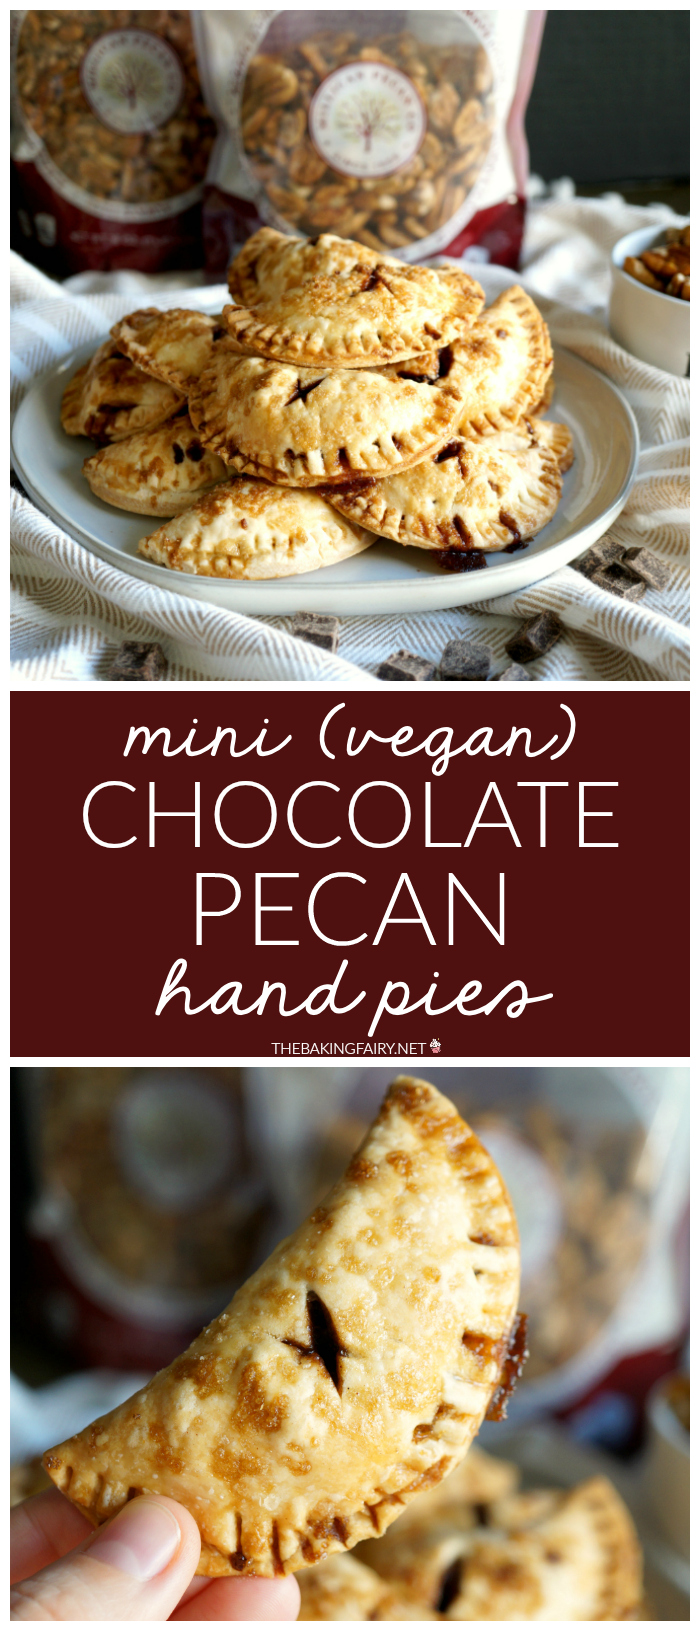 mini vegan chocolate pecan hand pies   The Baking Fairy #FallFlavors #ad